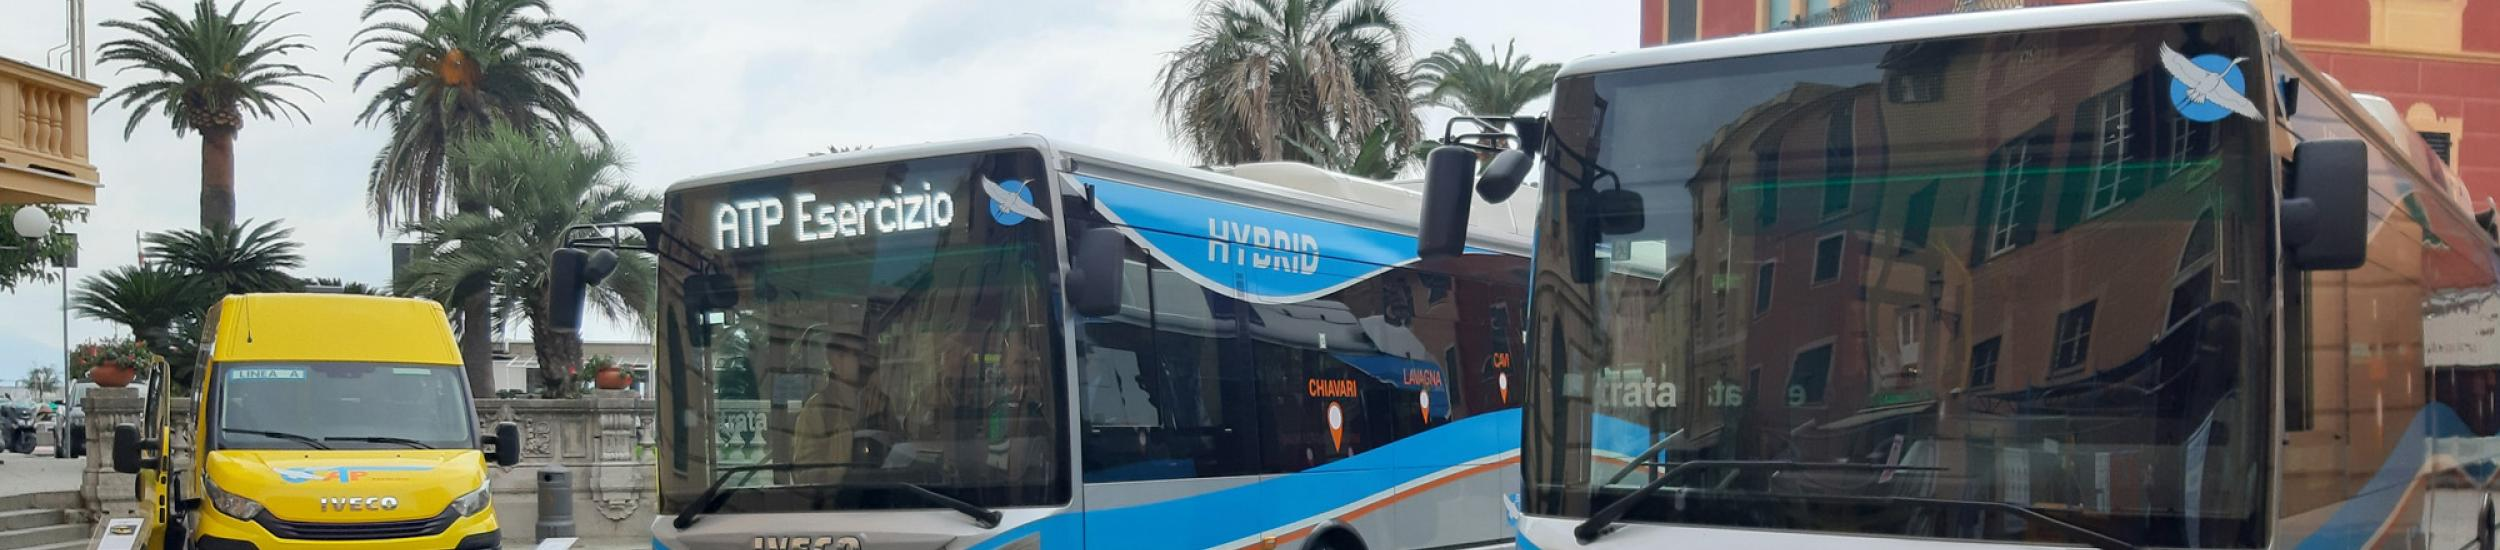 I nuovi bus ibridi e lo scuolabus ATP